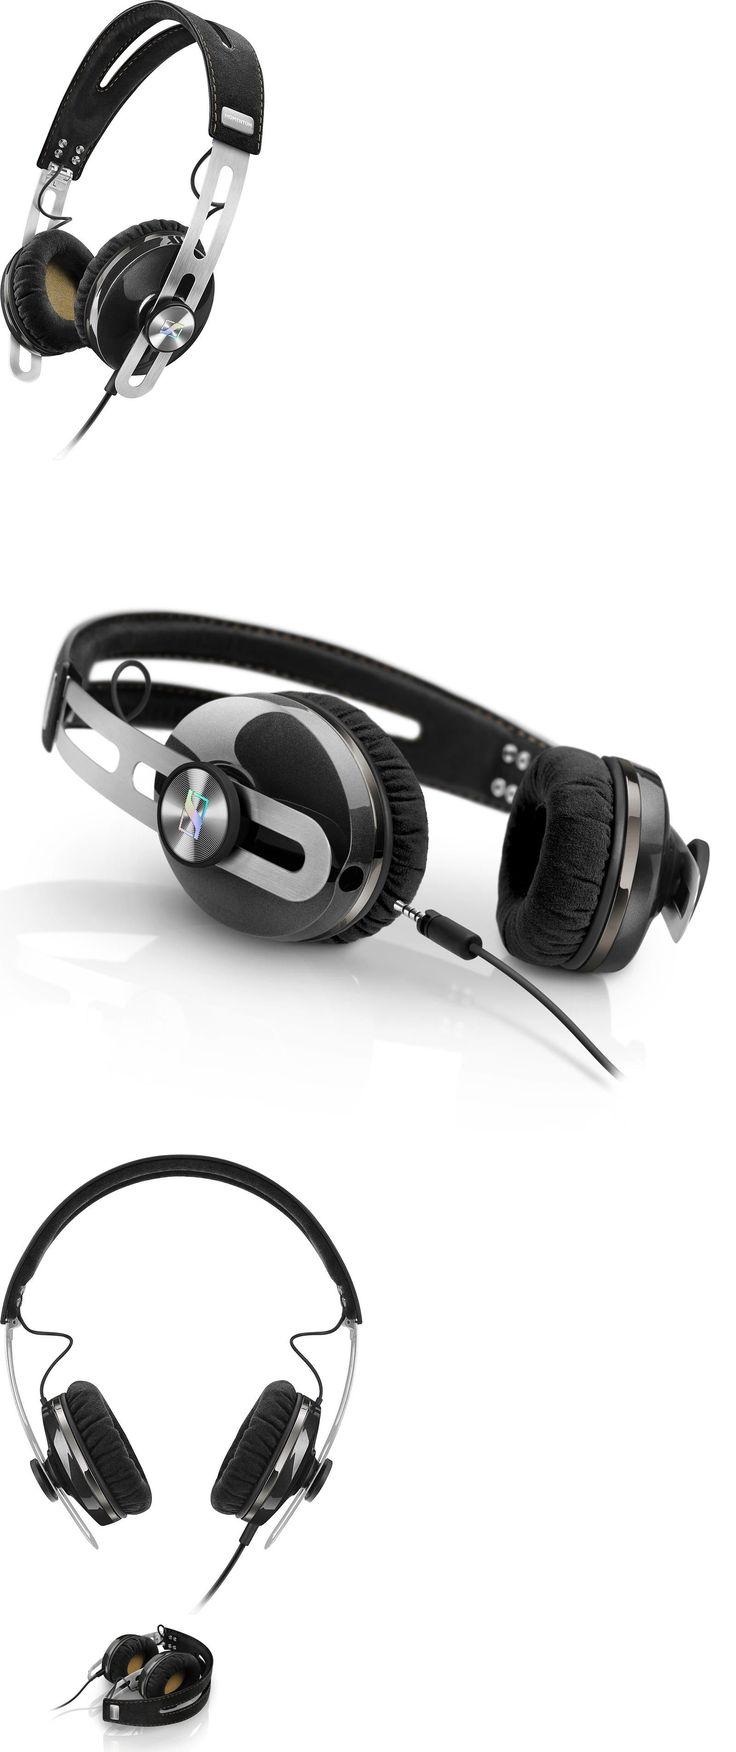 Headsets and Earpieces: Sennheiser Momentum 2.0 Oei On-Ear Supra Aural Stereo Headphones Black Apple -> BUY IT NOW ONLY: $149.99 on eBay!